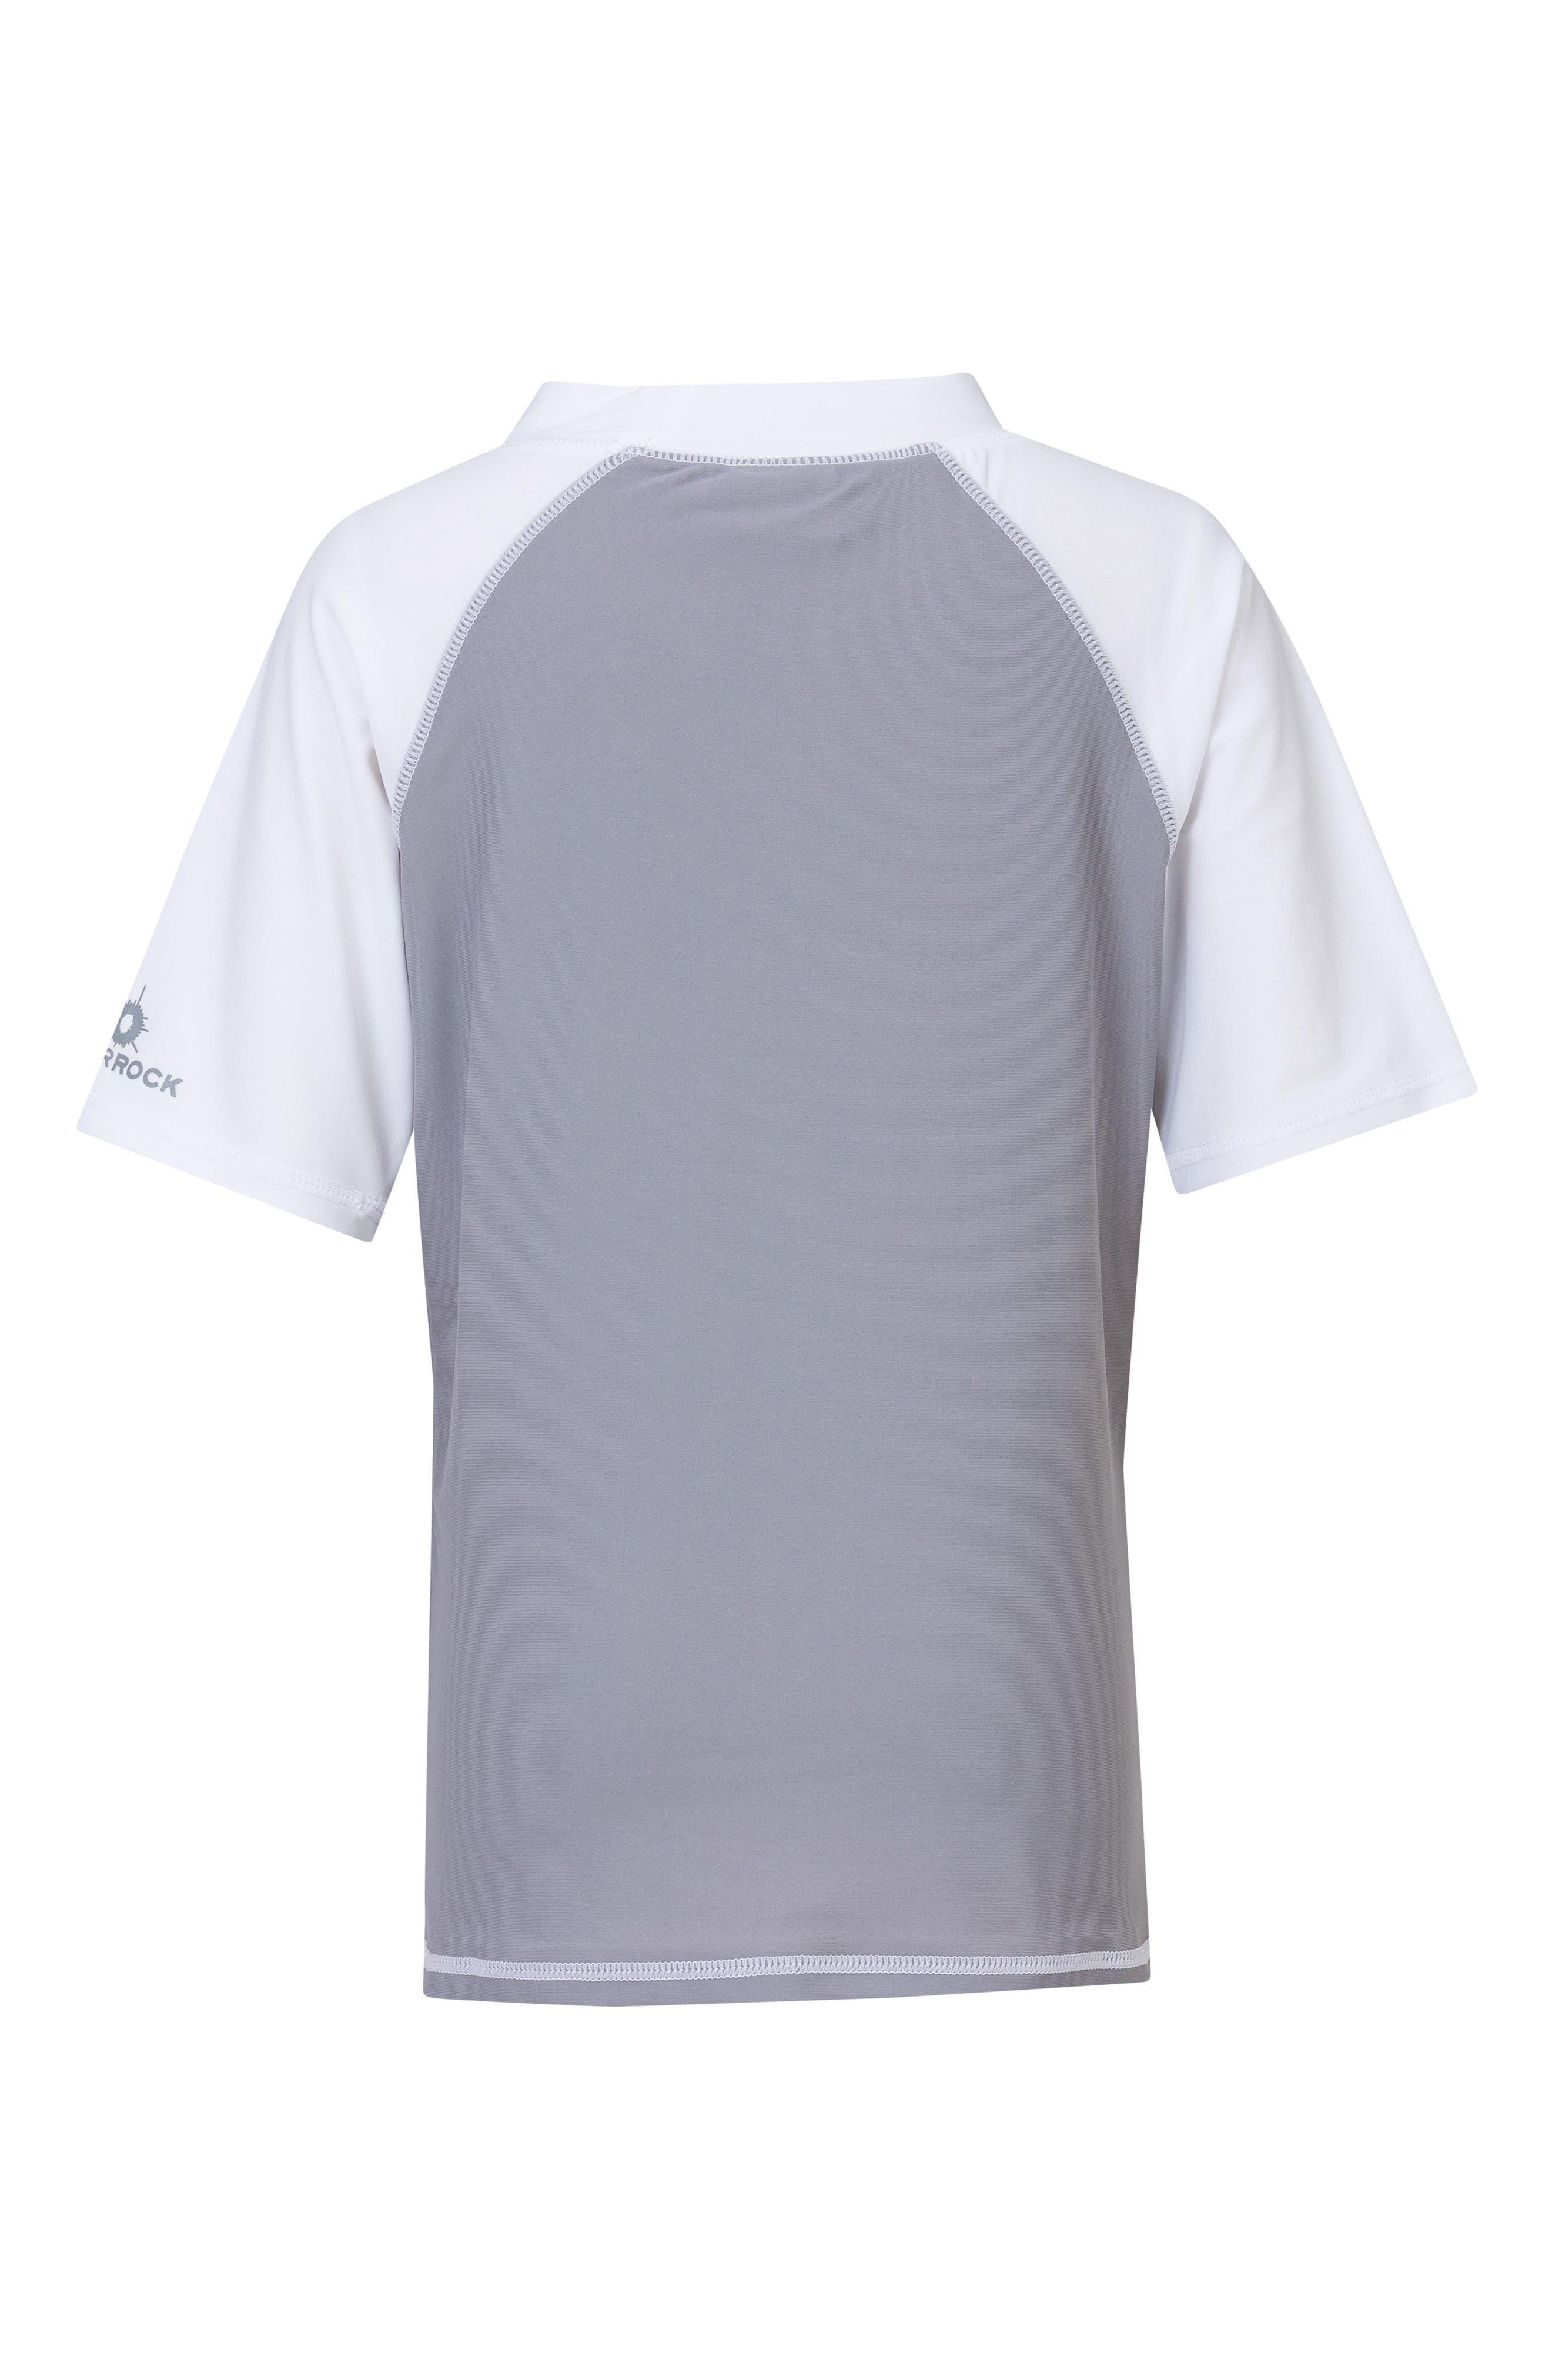 Raglan Short Sleeve Rashguard,                             Alternate thumbnail 2, color,                             GREY/ WHITE